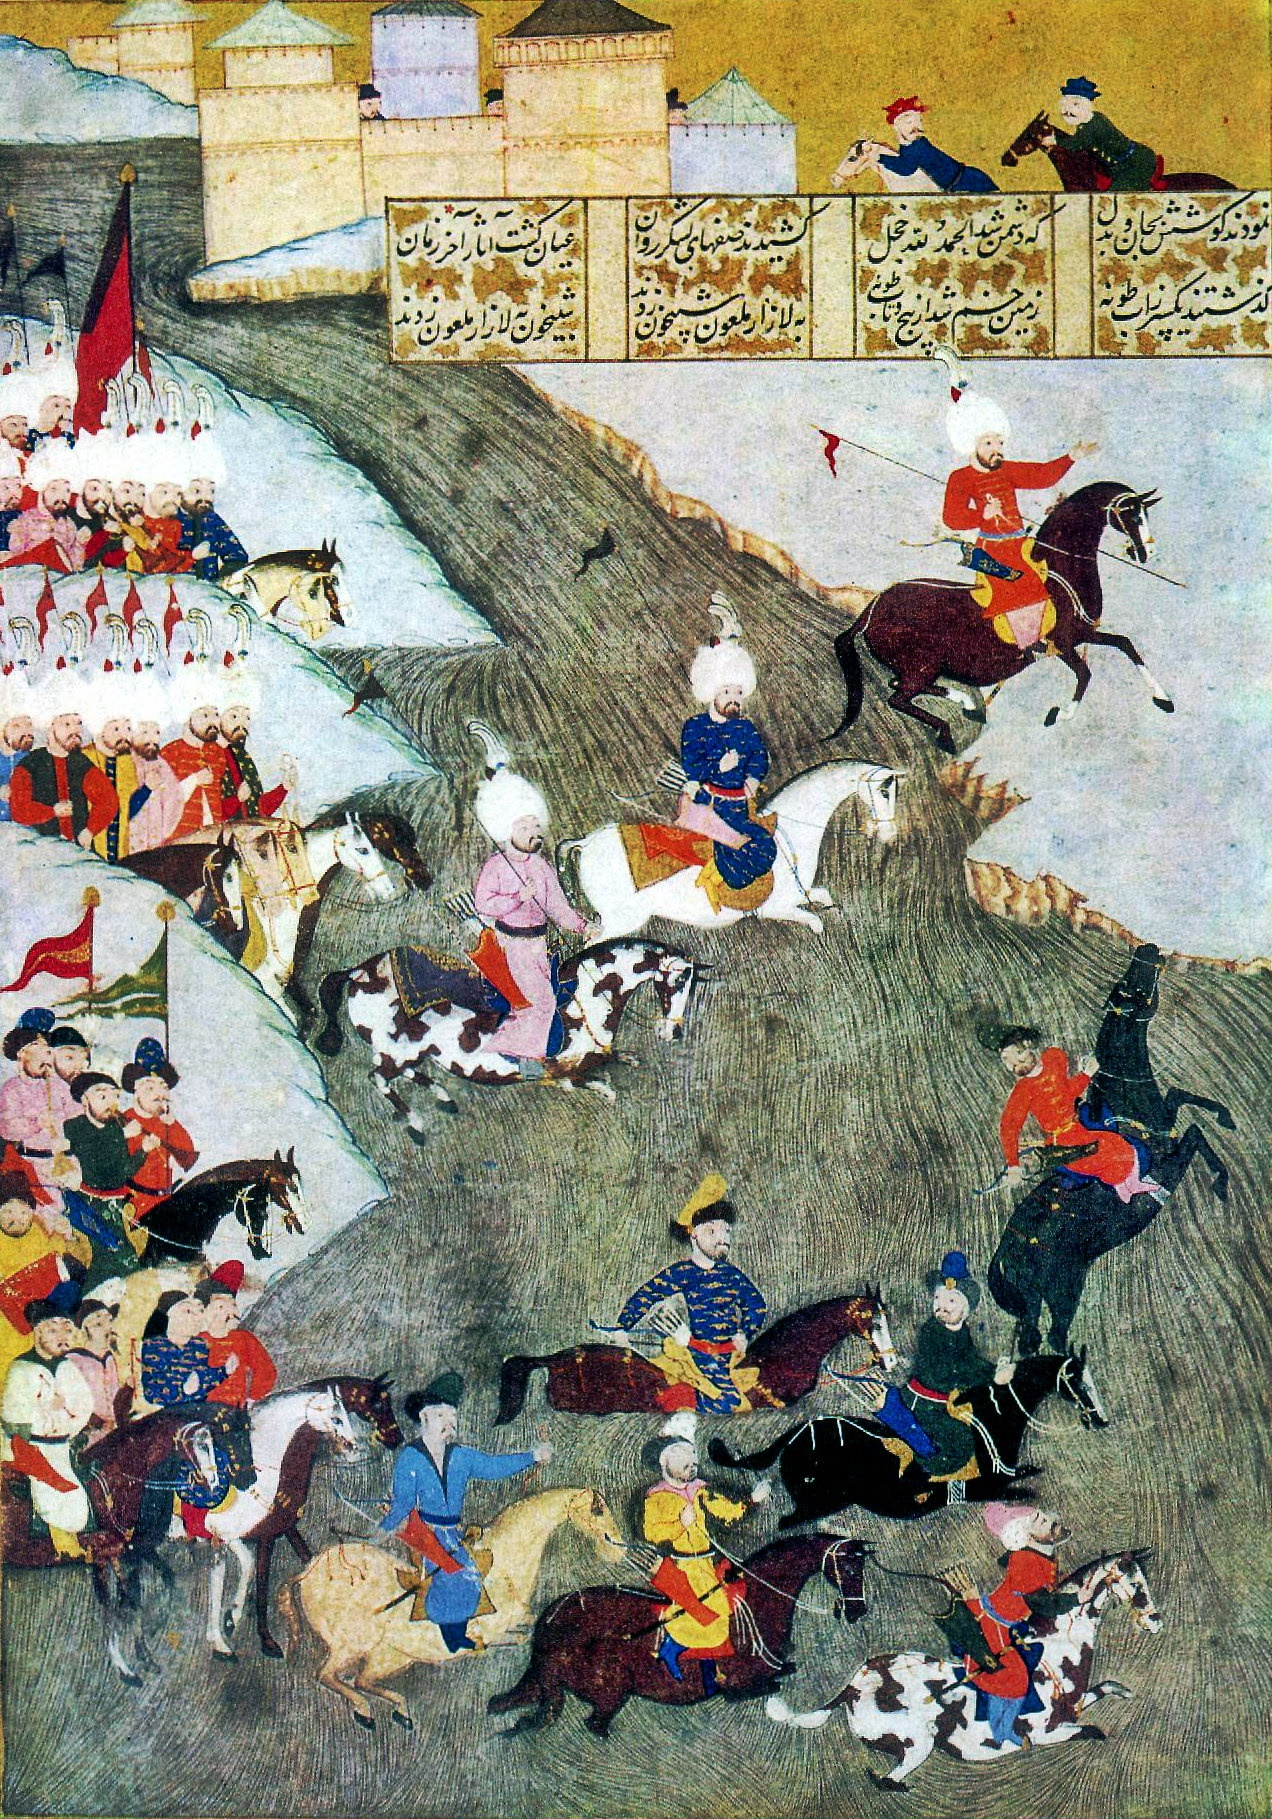 Miniature: Szigetvár campaign 1566, Tatars as avantgarde.